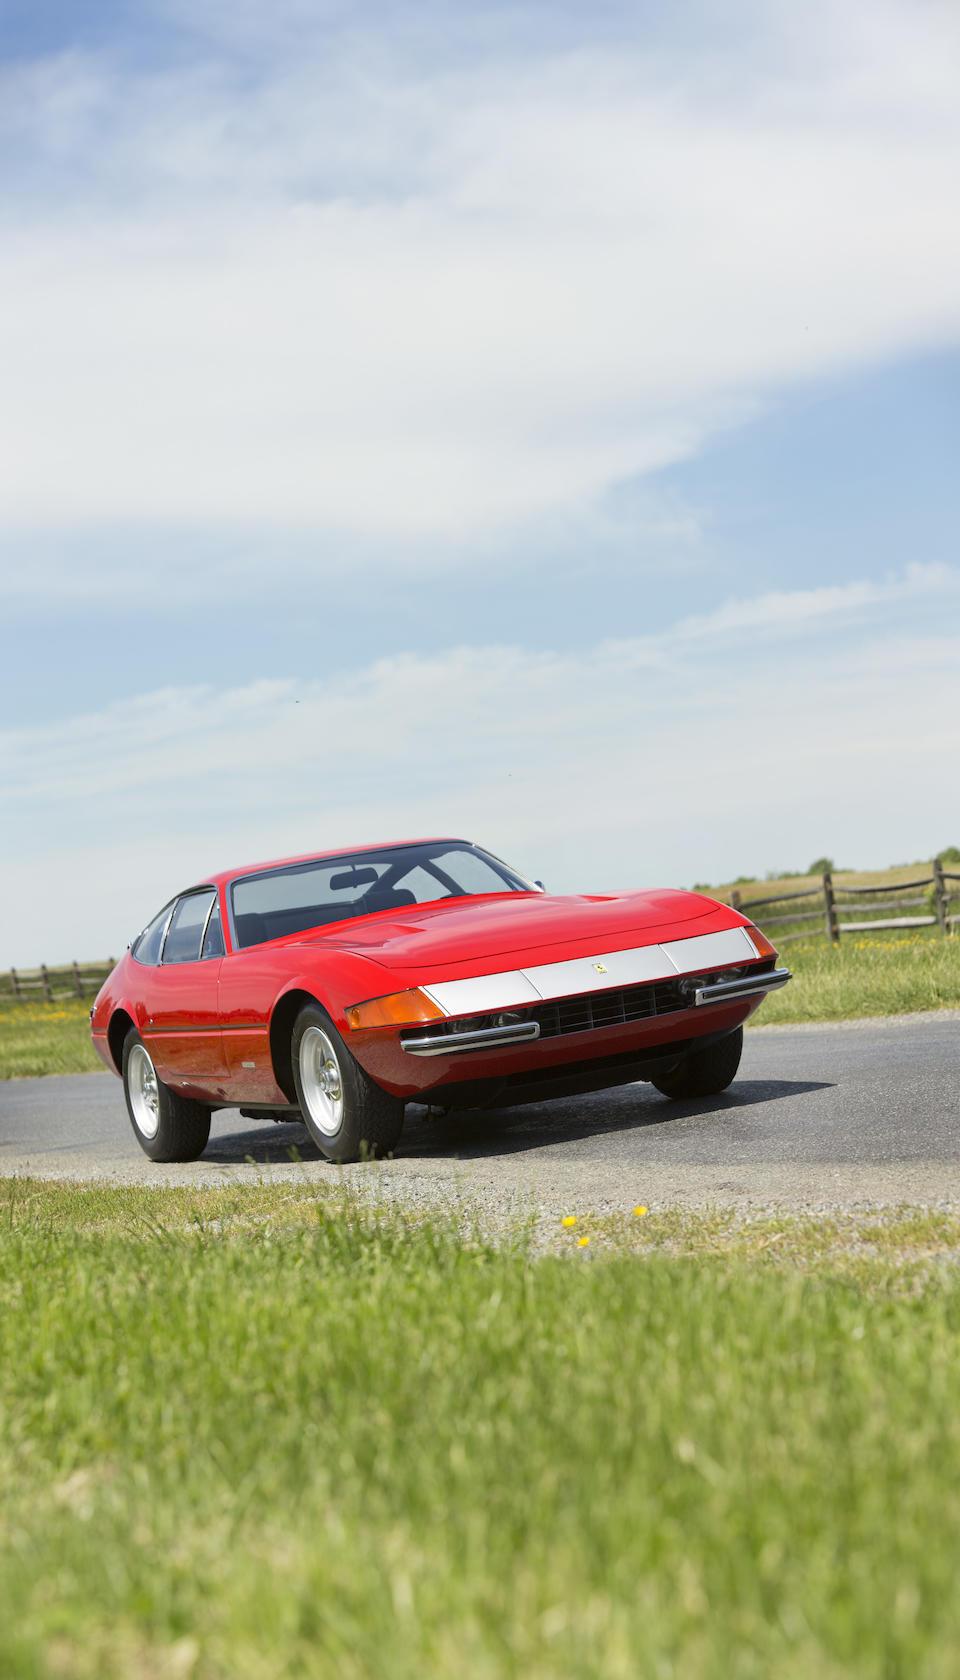 1971 Ferrari 365GTB/4 Daytona Berlinetta  Chassis no. 14233 Engine no. B806